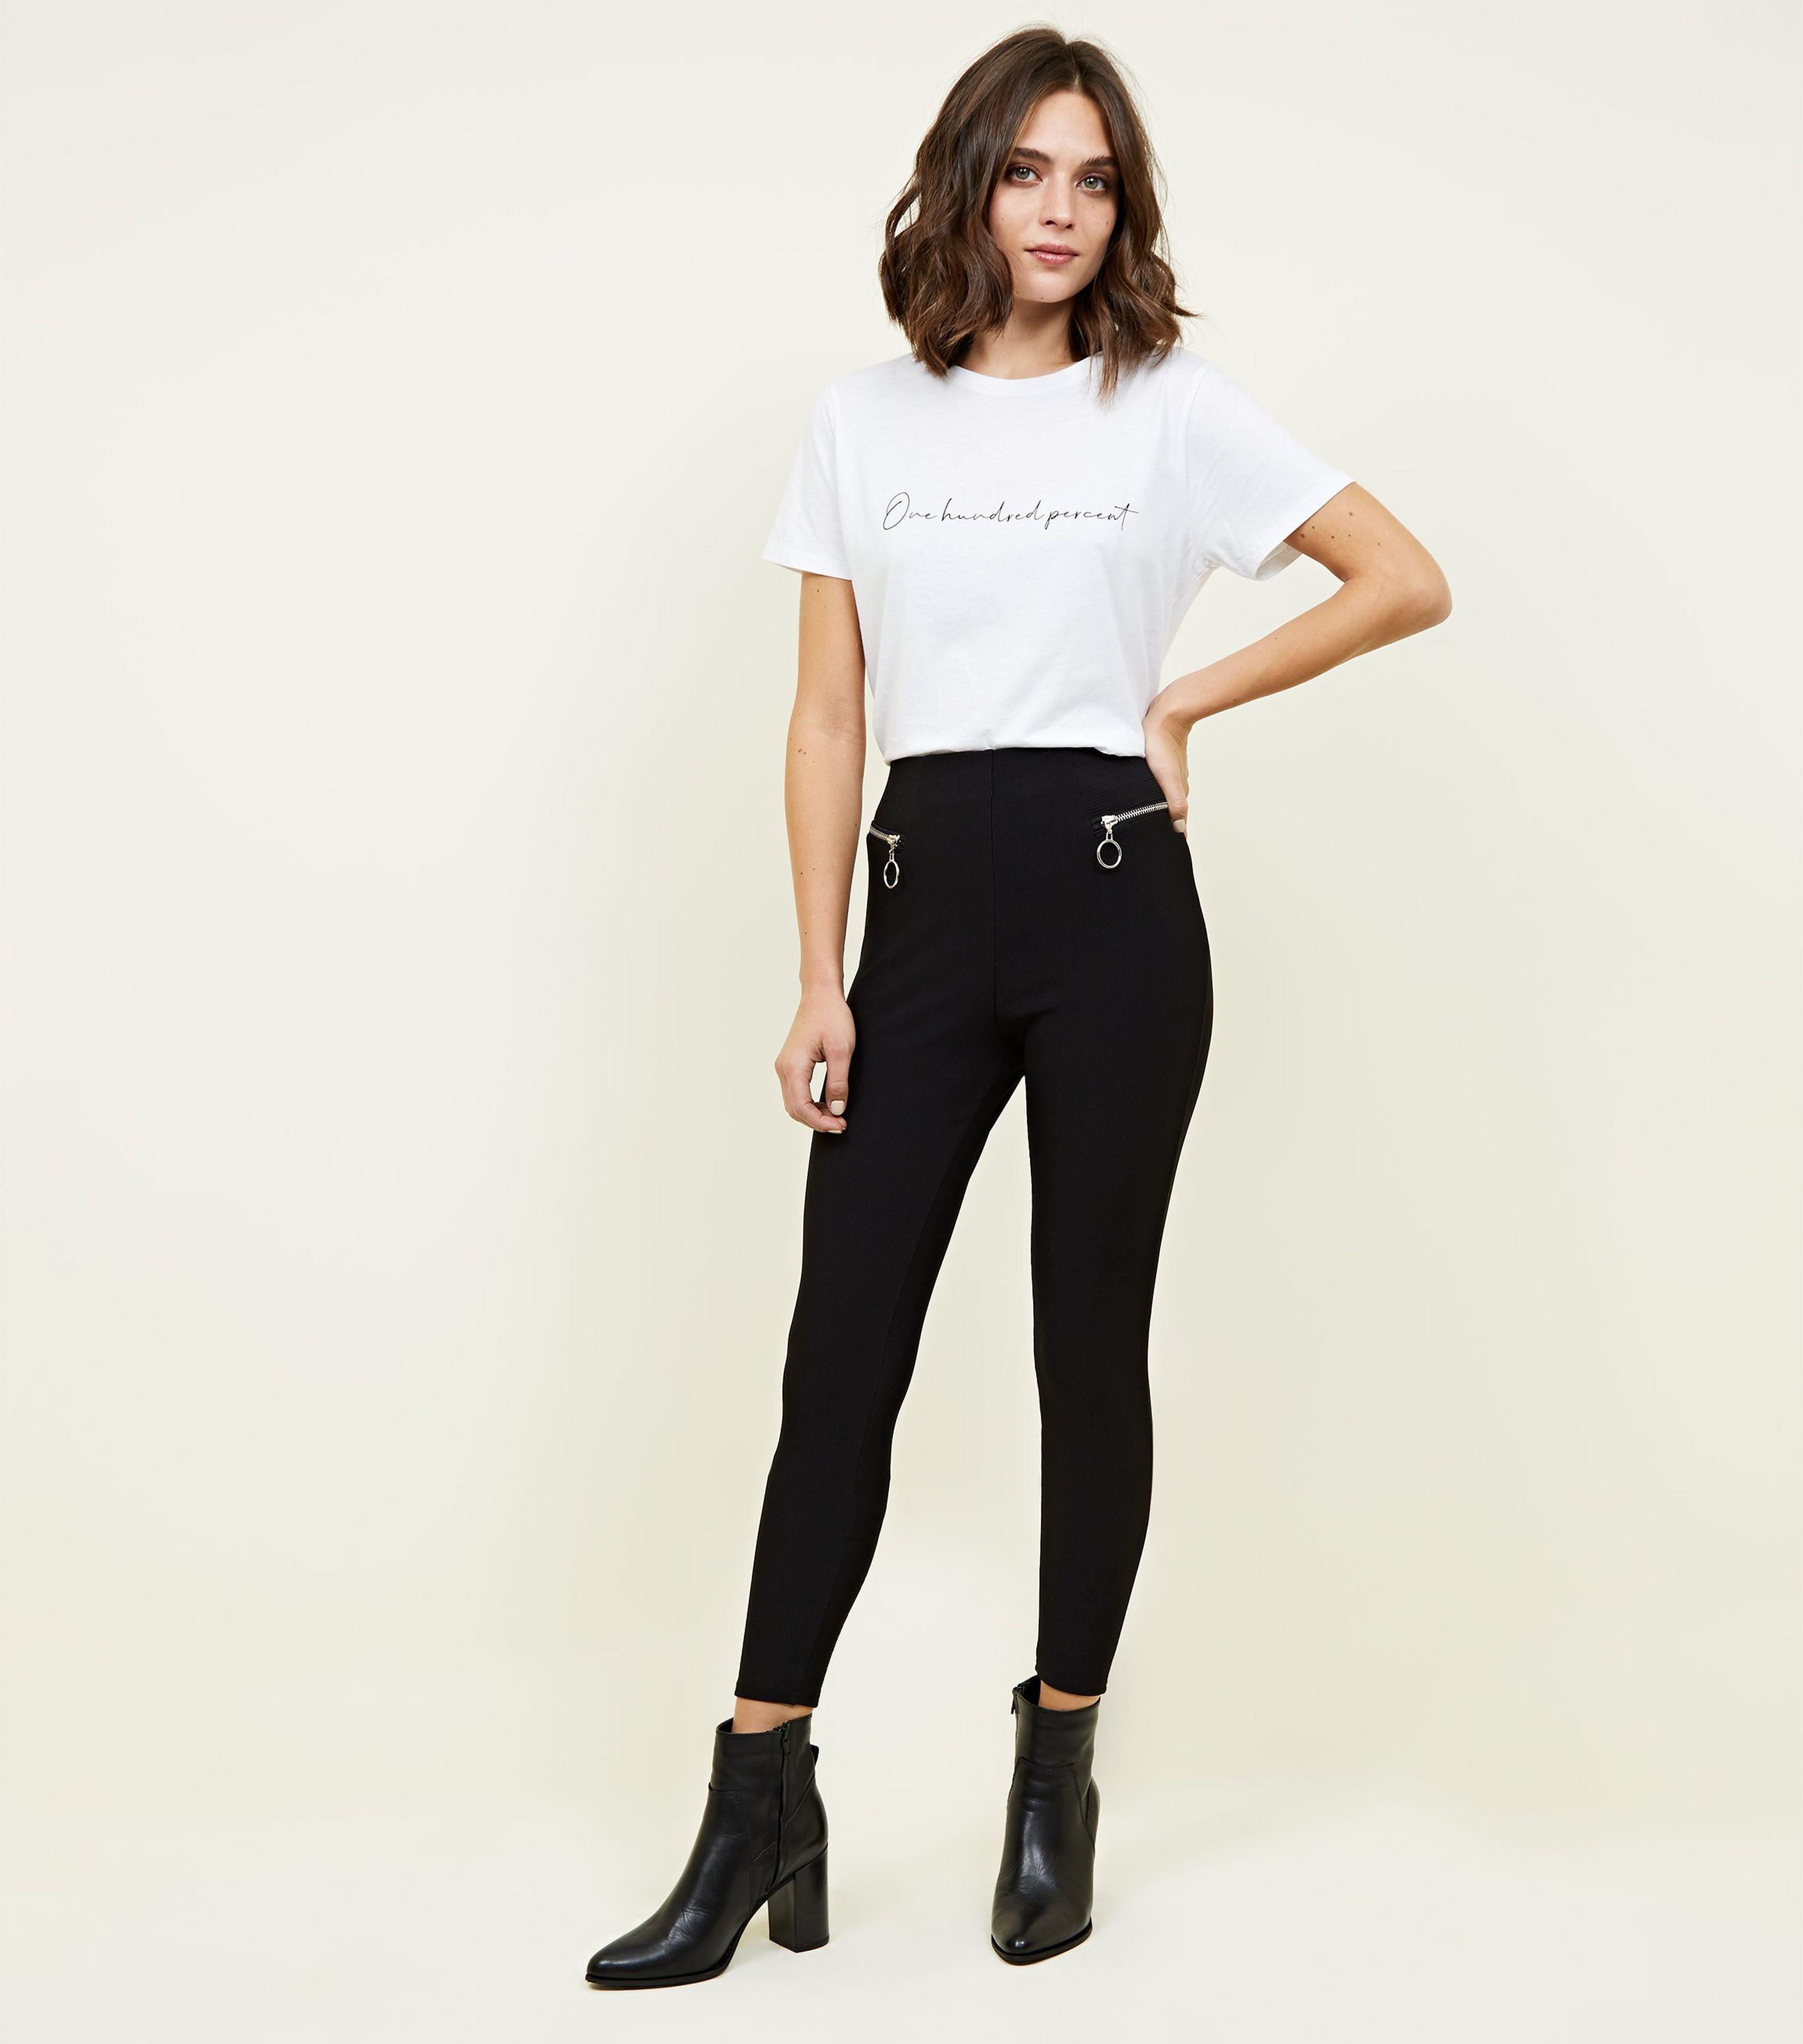 578e8e3004d New Look Black Ribbed Zip Side Leggings in Black - Lyst